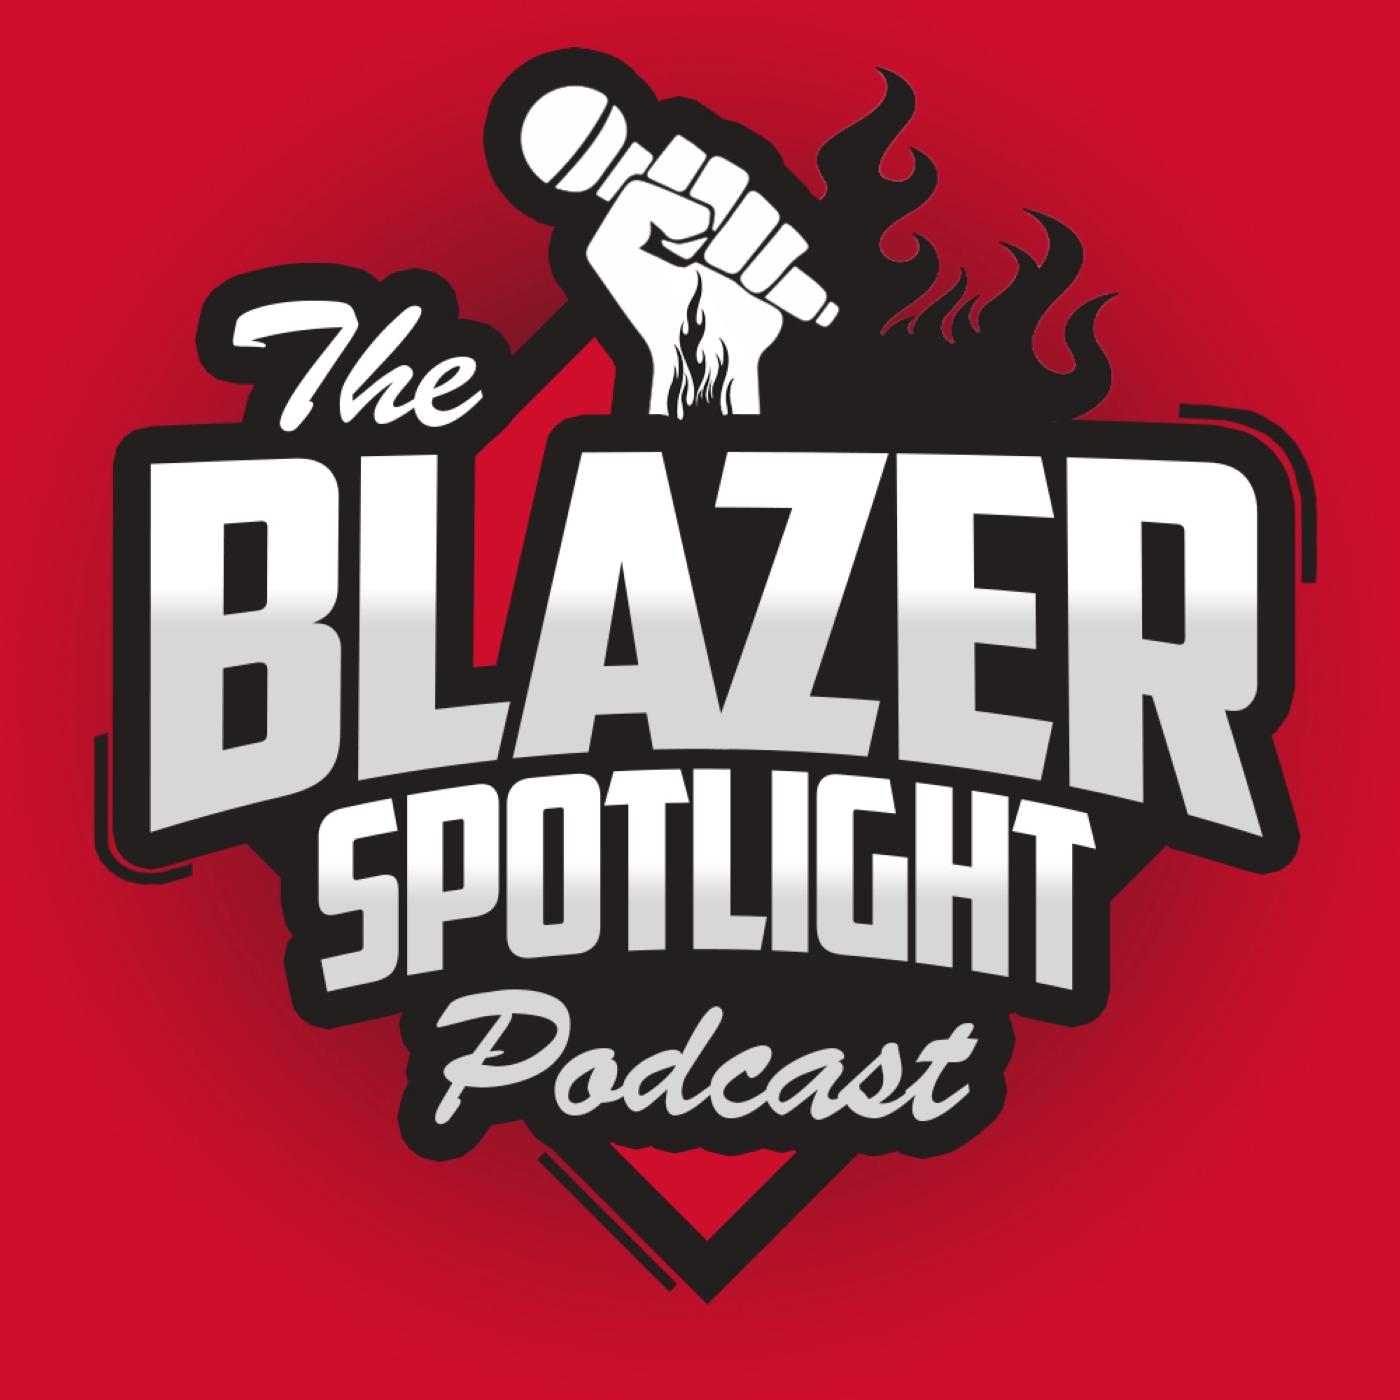 The Blazer Spotlight